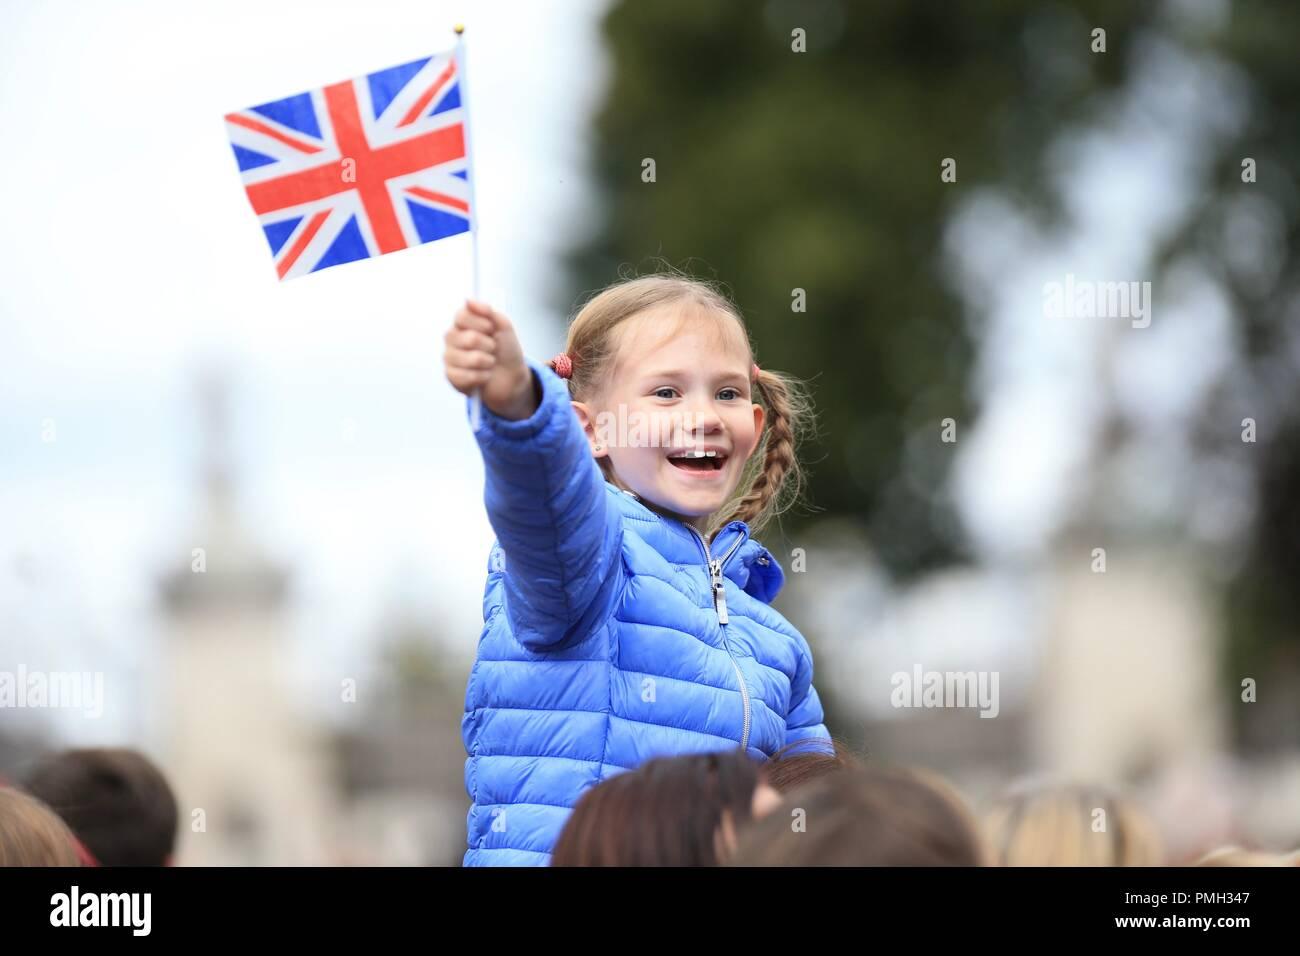 Little girl waving a Union Jack flag UK - Stock Image